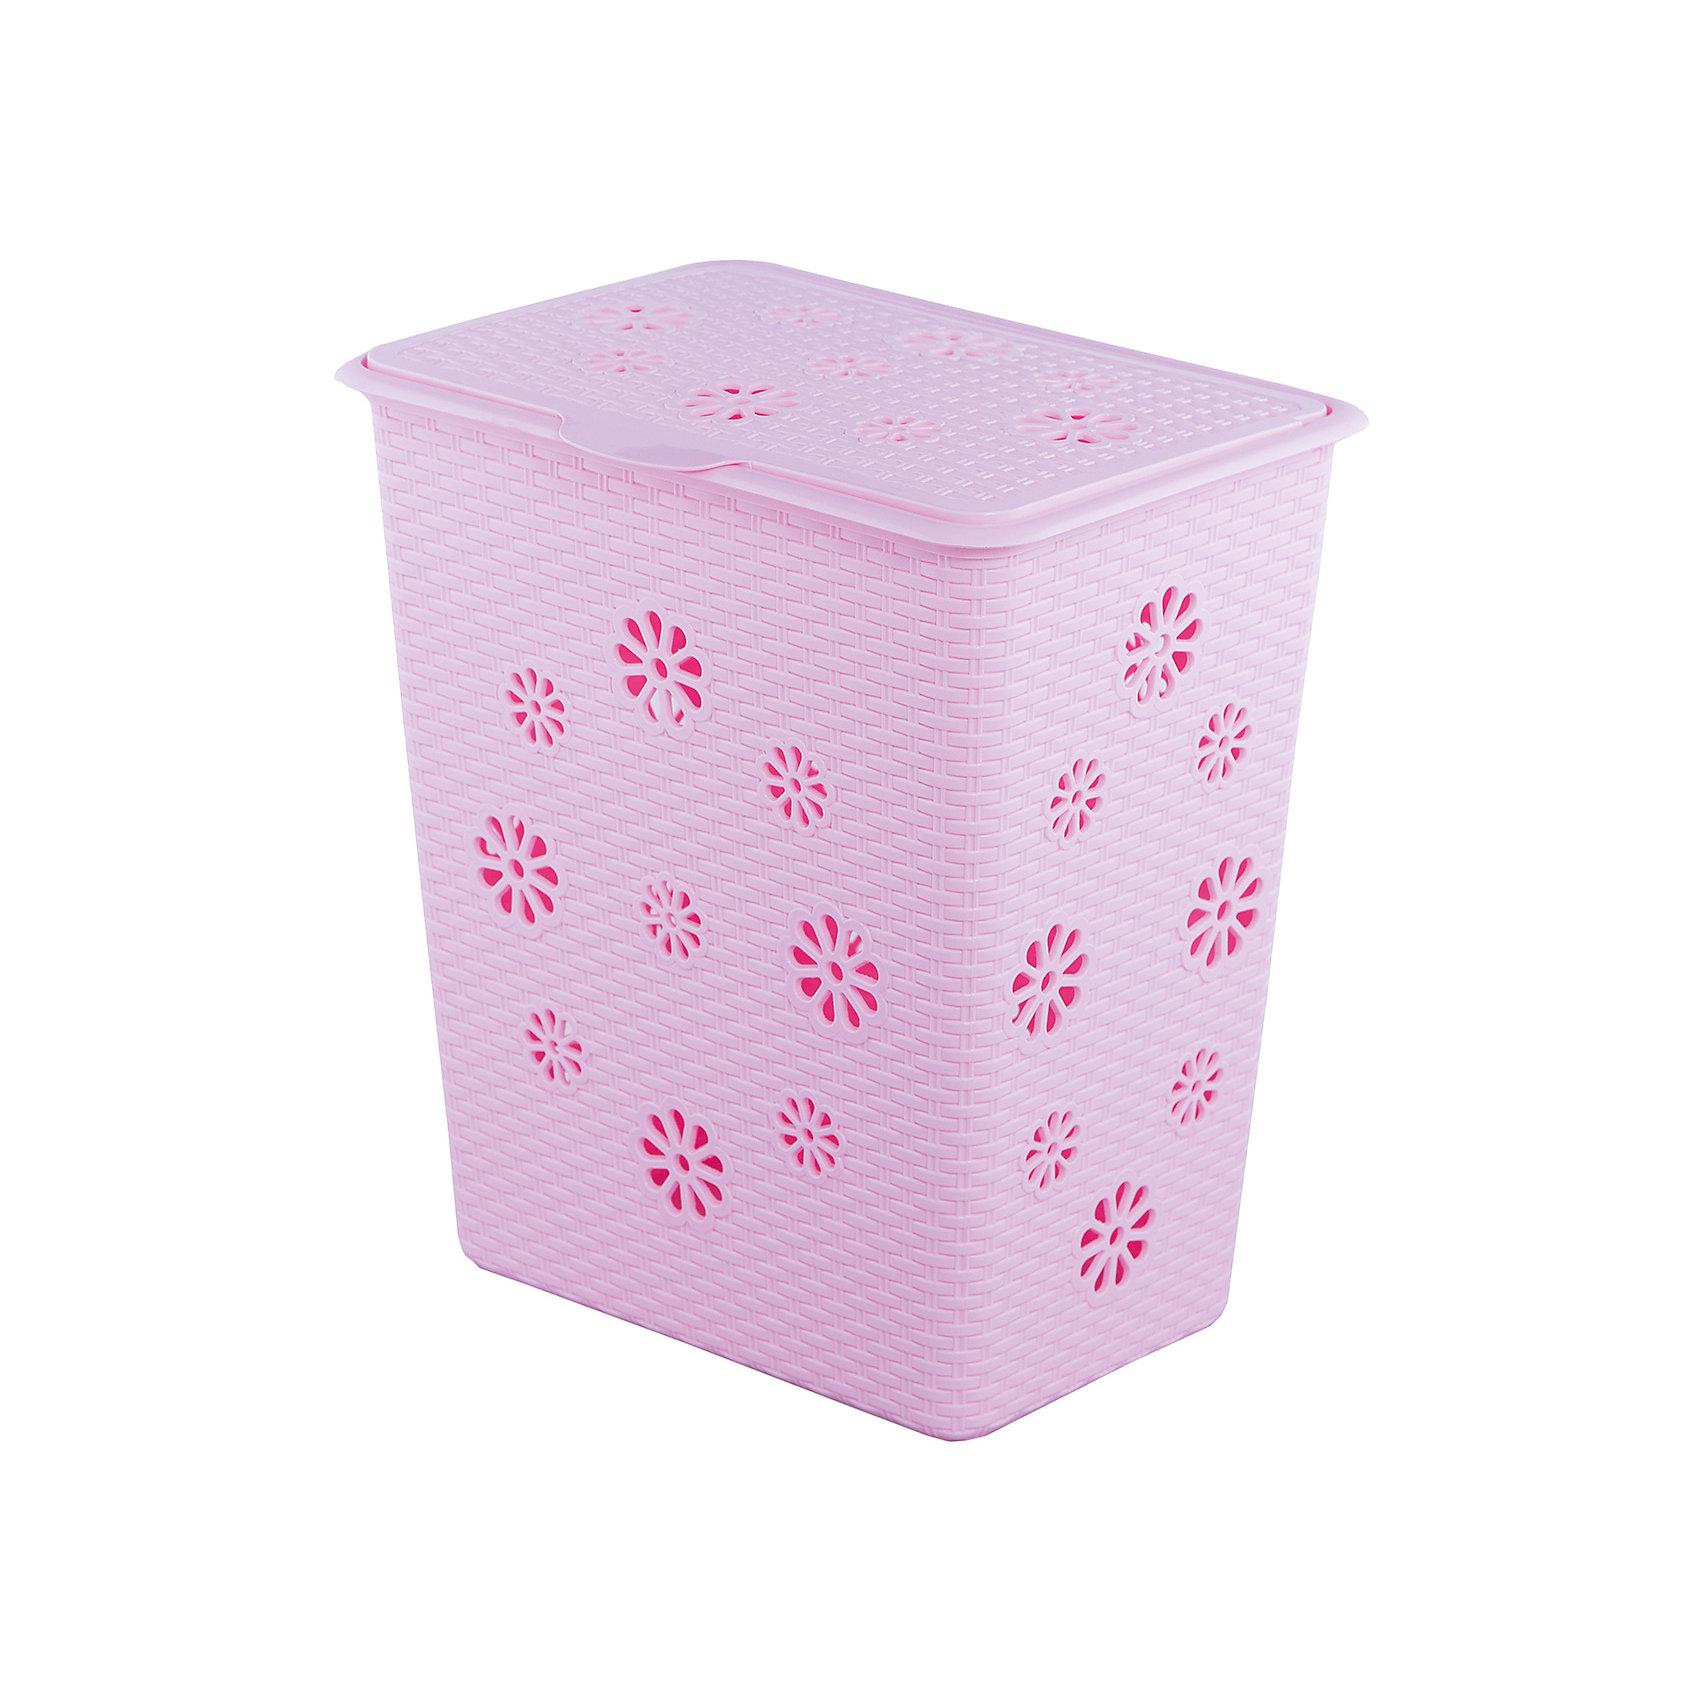 Alternativa Корзина для белья Плетёнка 60л. , Alternativa, розовый alternativa горка для купания alternativa розовый